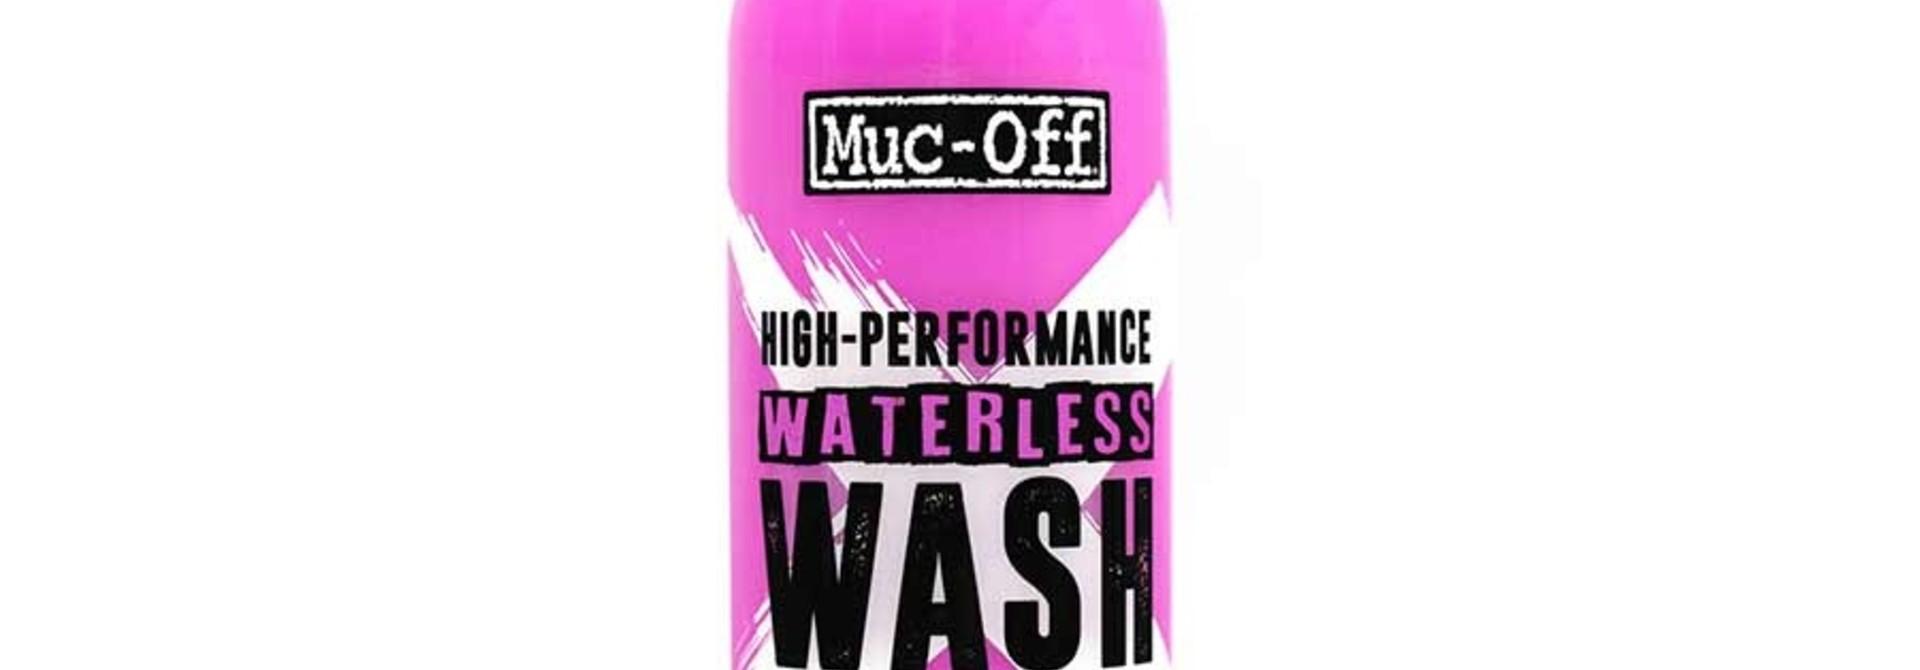 Muc-Off, High Performance Waterless Wash, 750ml, 1132CA (FR/ENG)